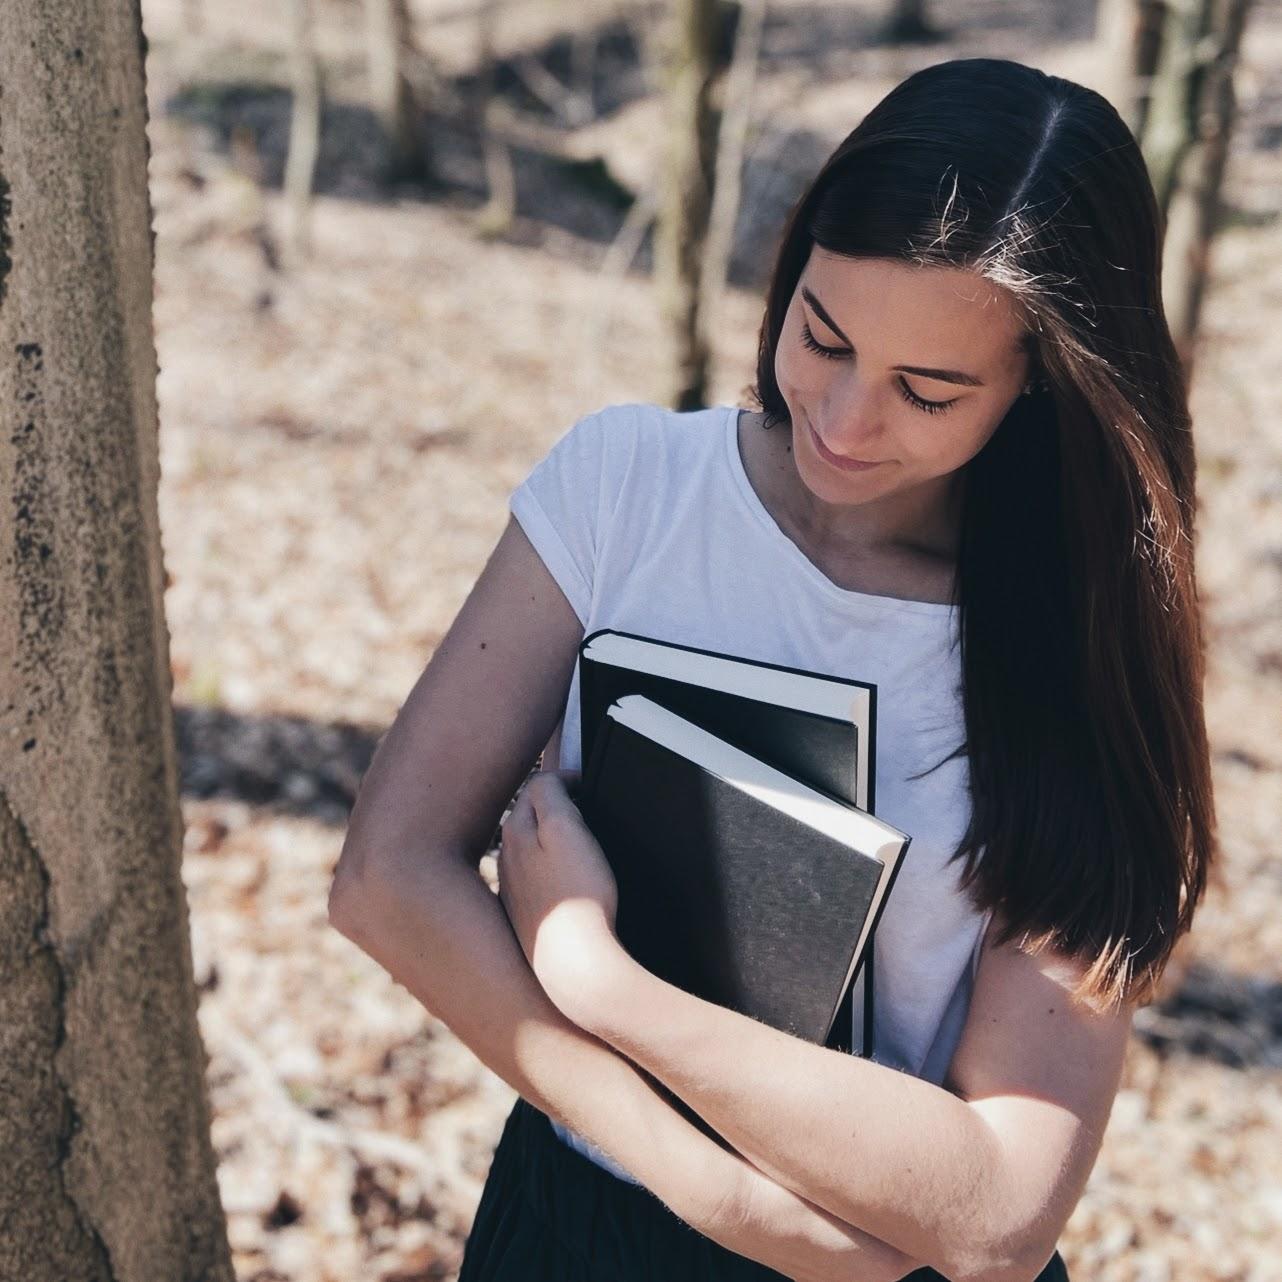 Bücherblog. Prettytigers Bücherregal. Profilbild. Lisa.